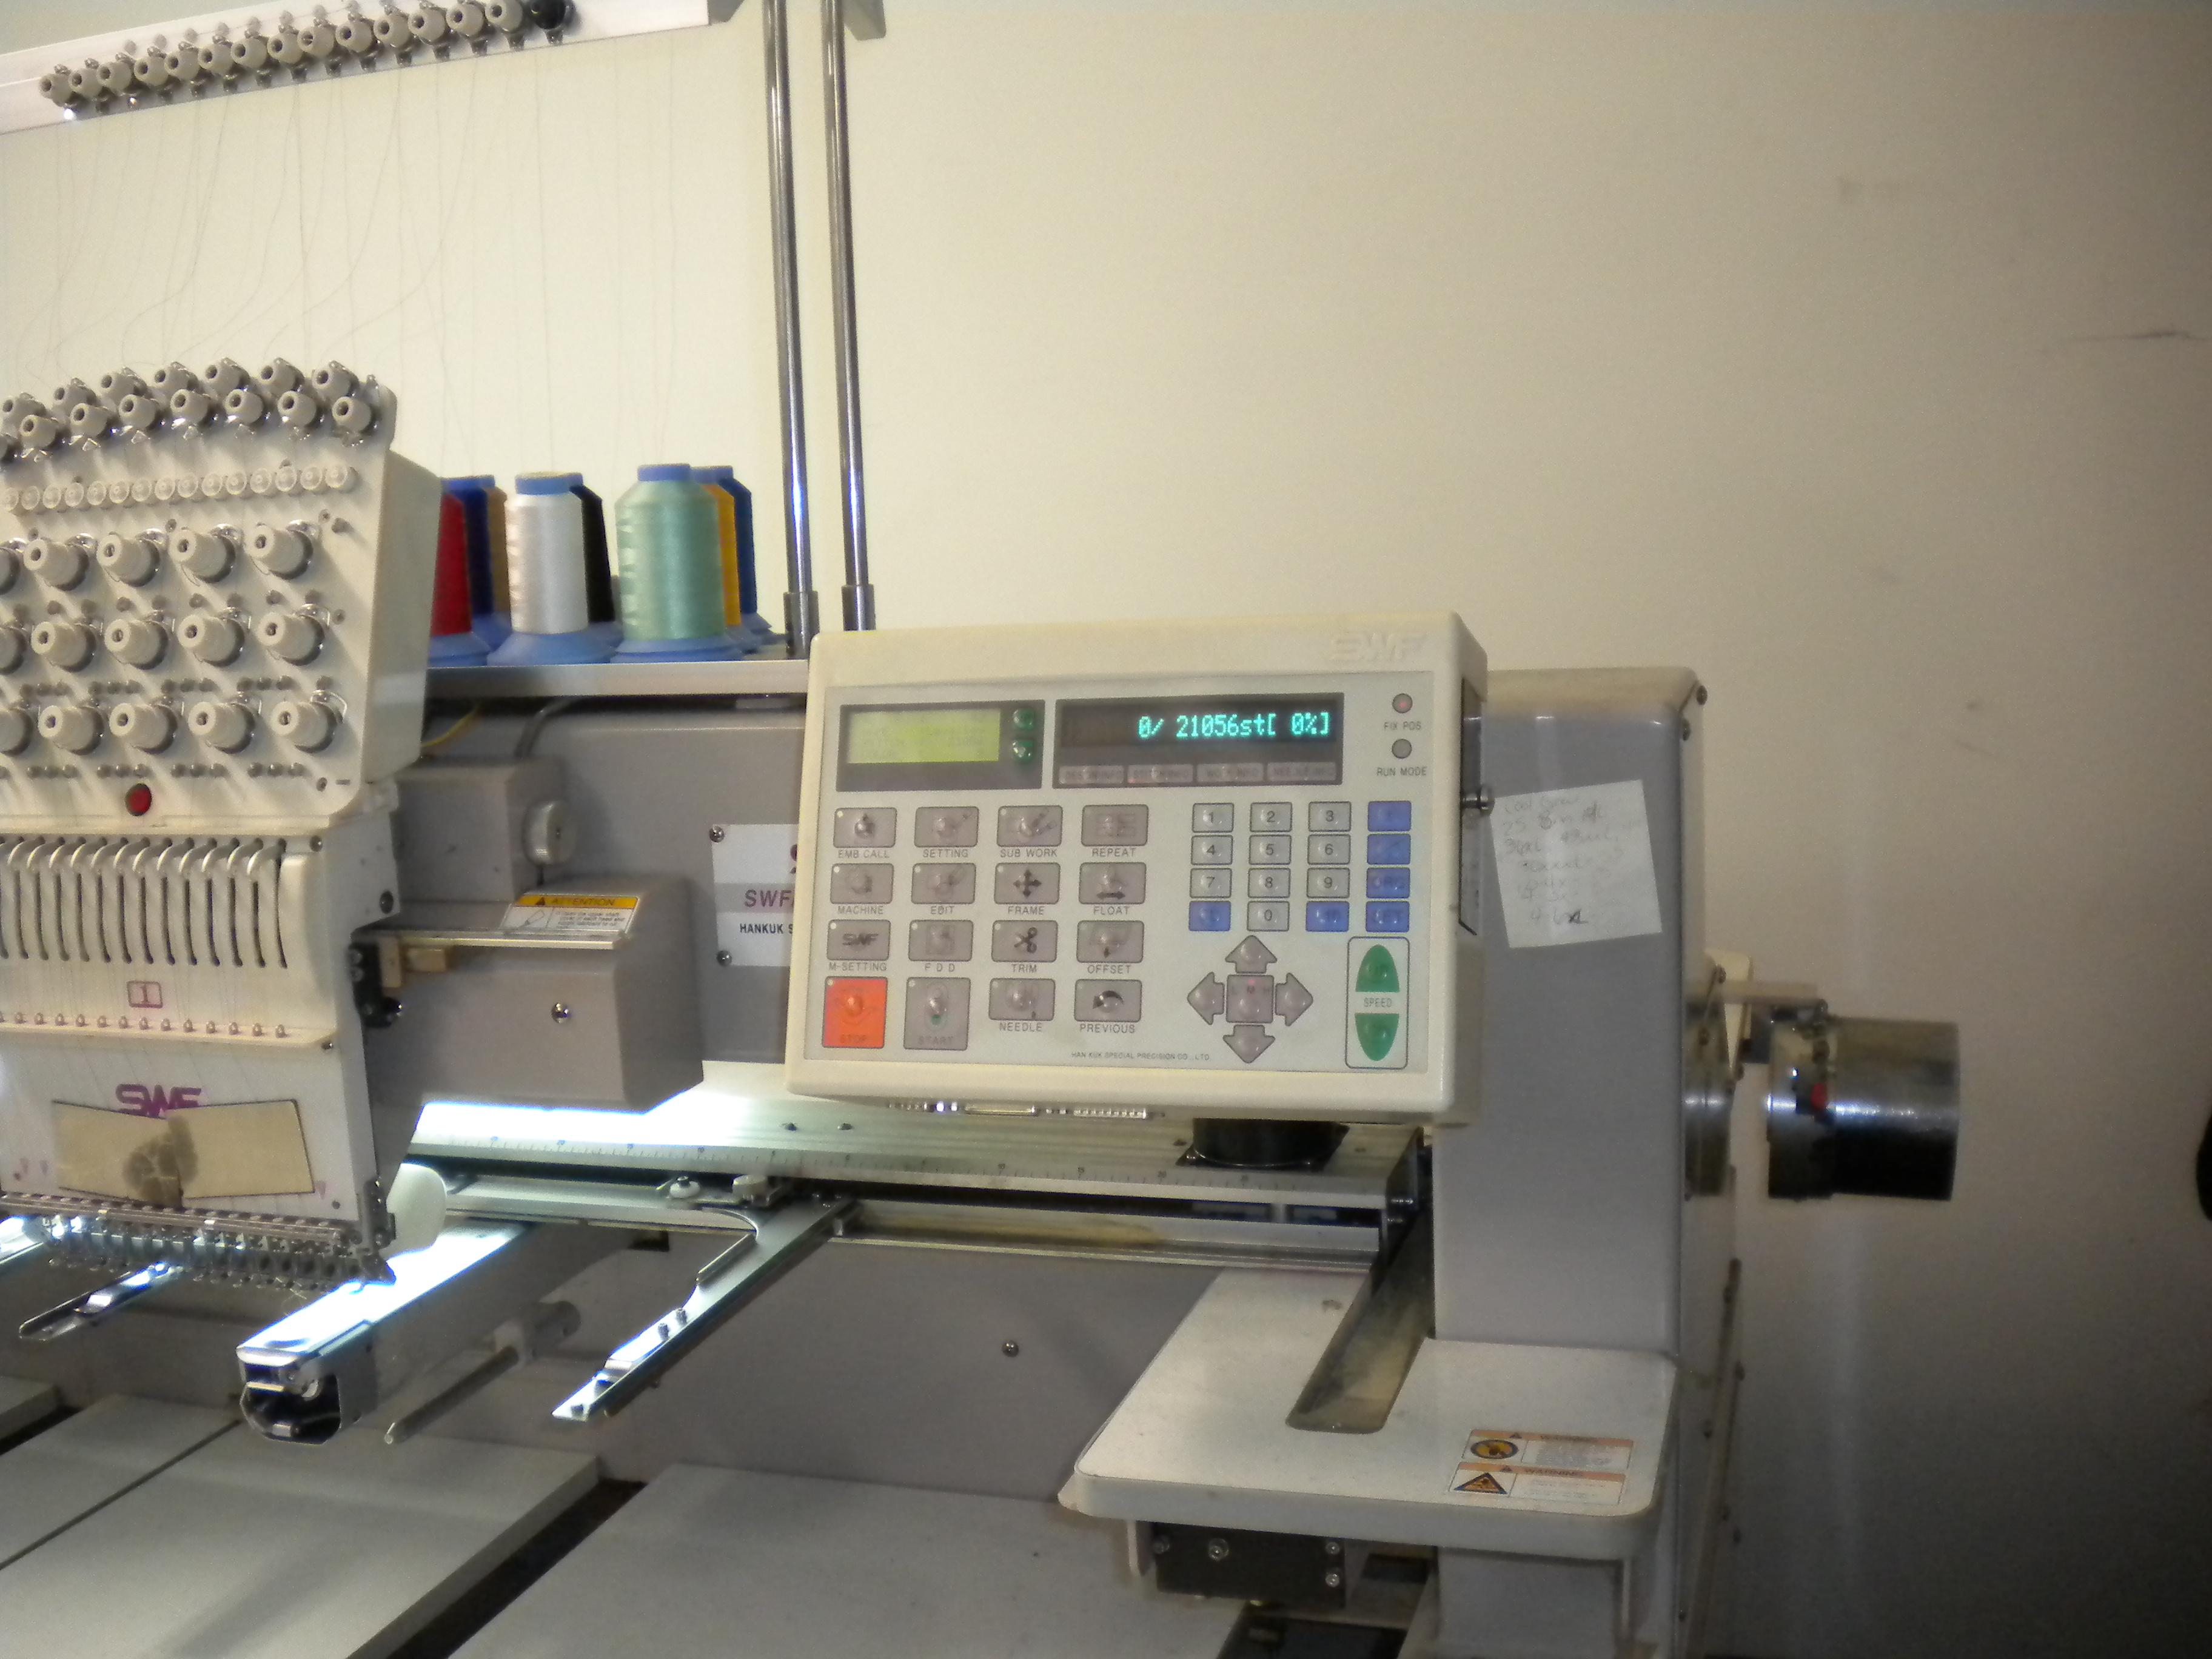 2001 Swf 6 Head 15 Needle Embroidery Machine